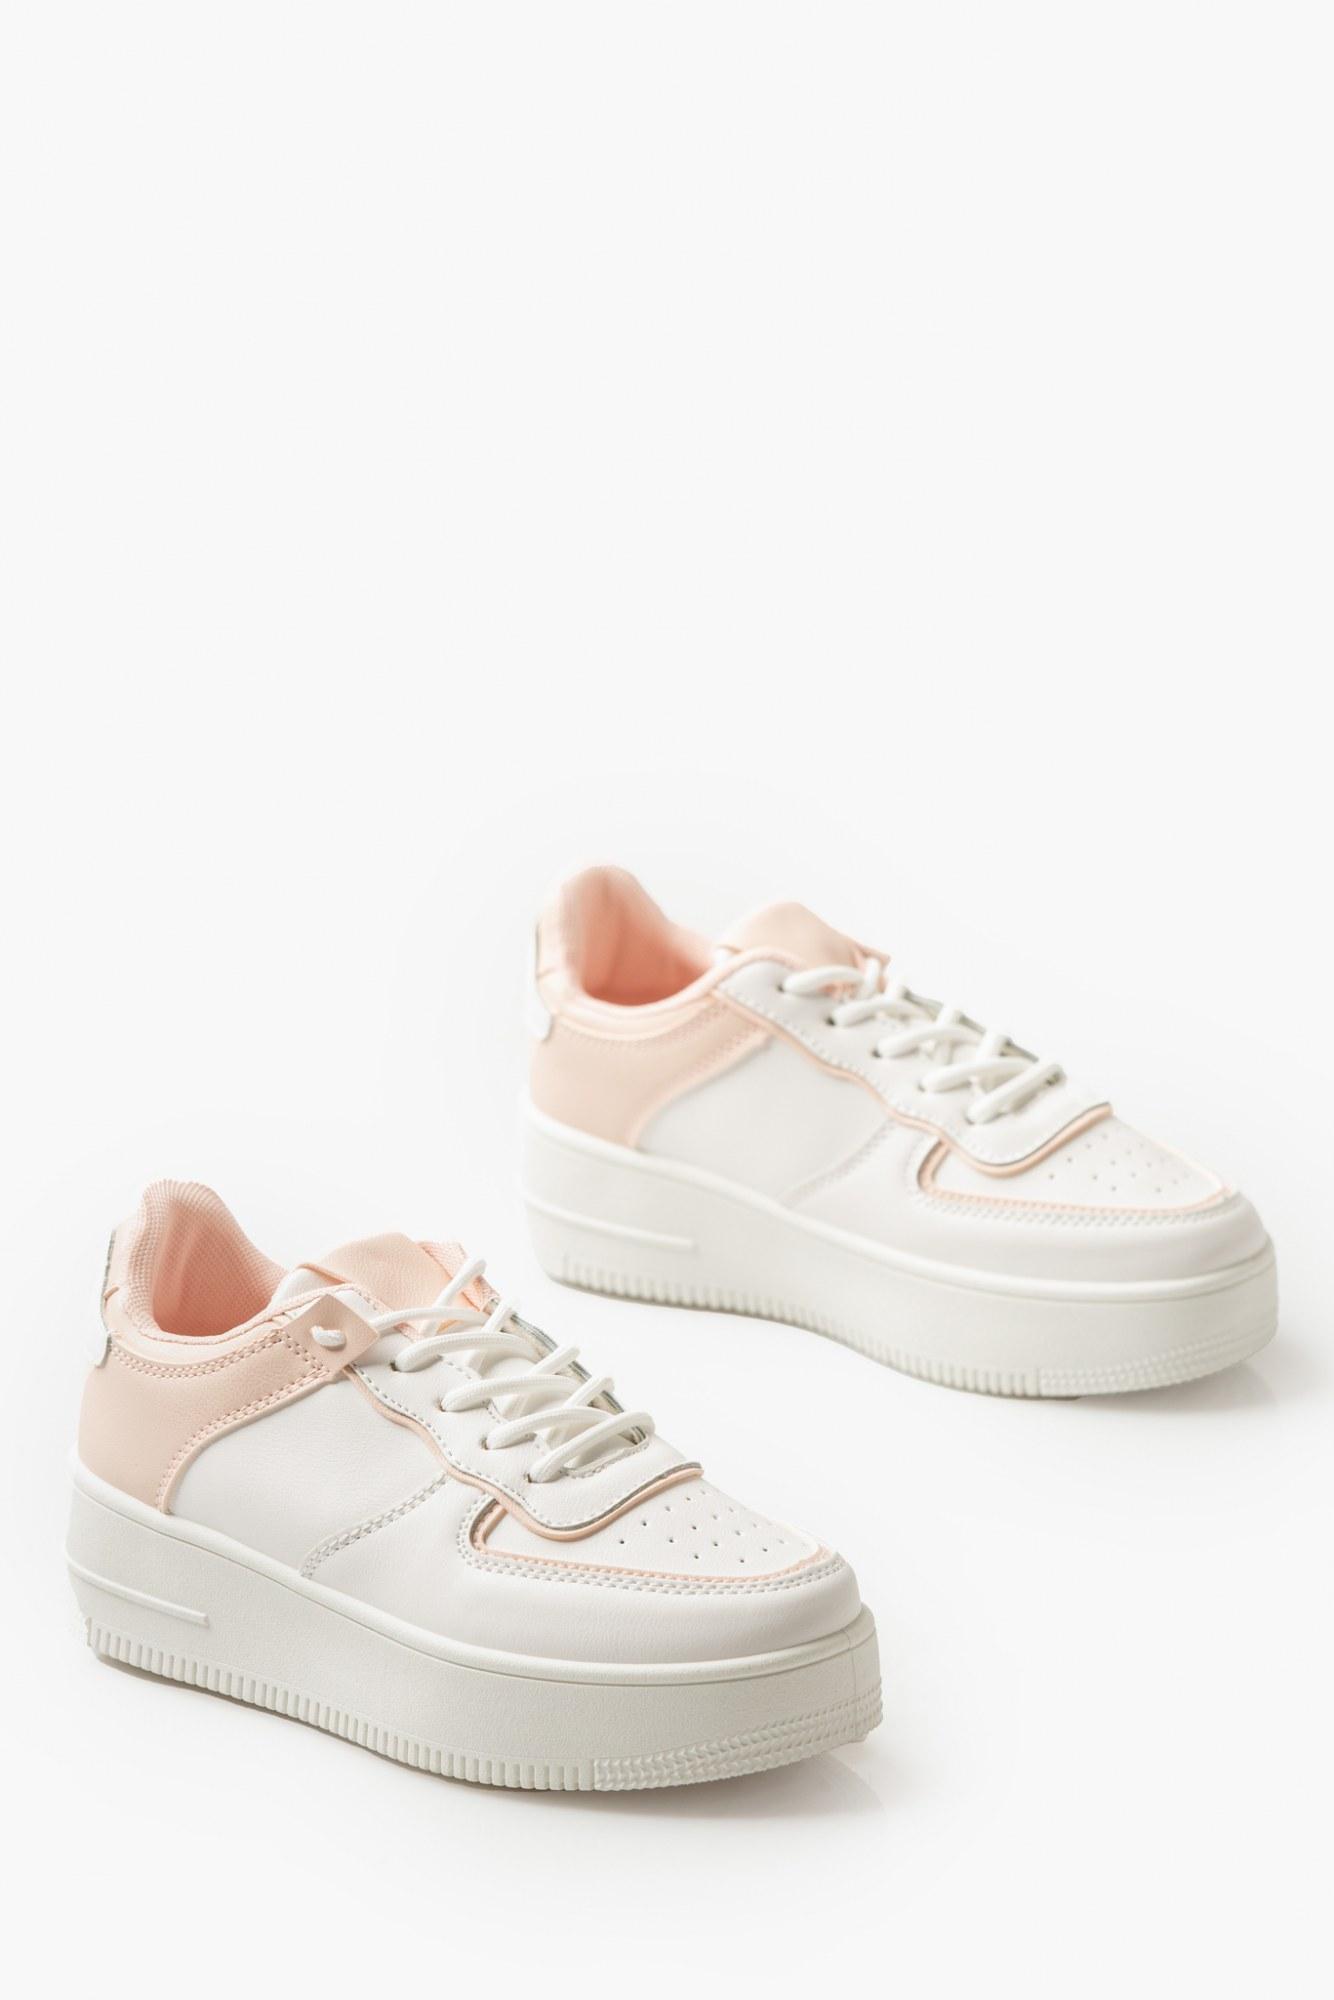 Sneakers λευκά δίπατα με ροζ λεπτομέρειες